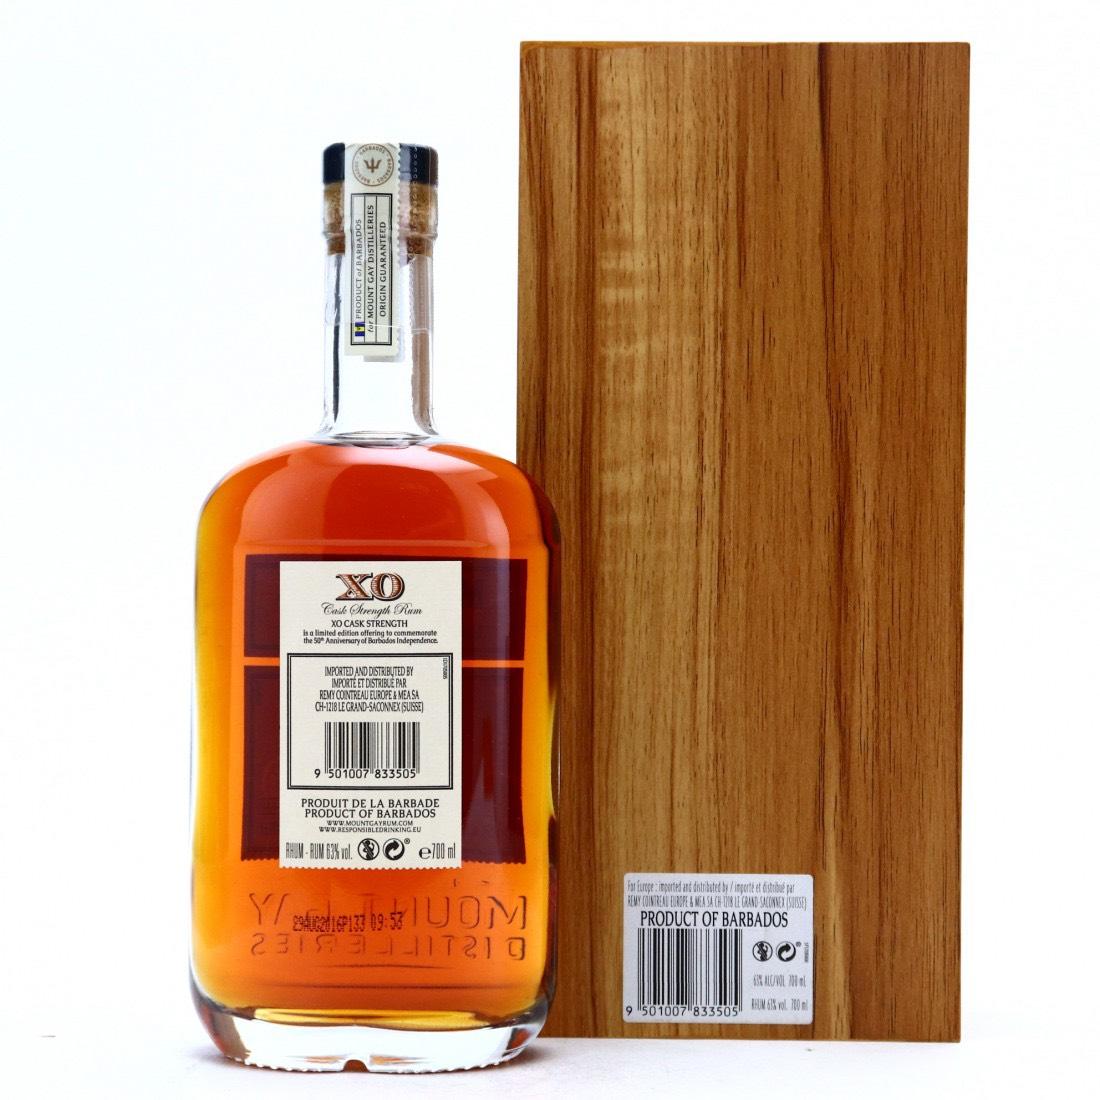 Bottle image of Extra Old XO Rum